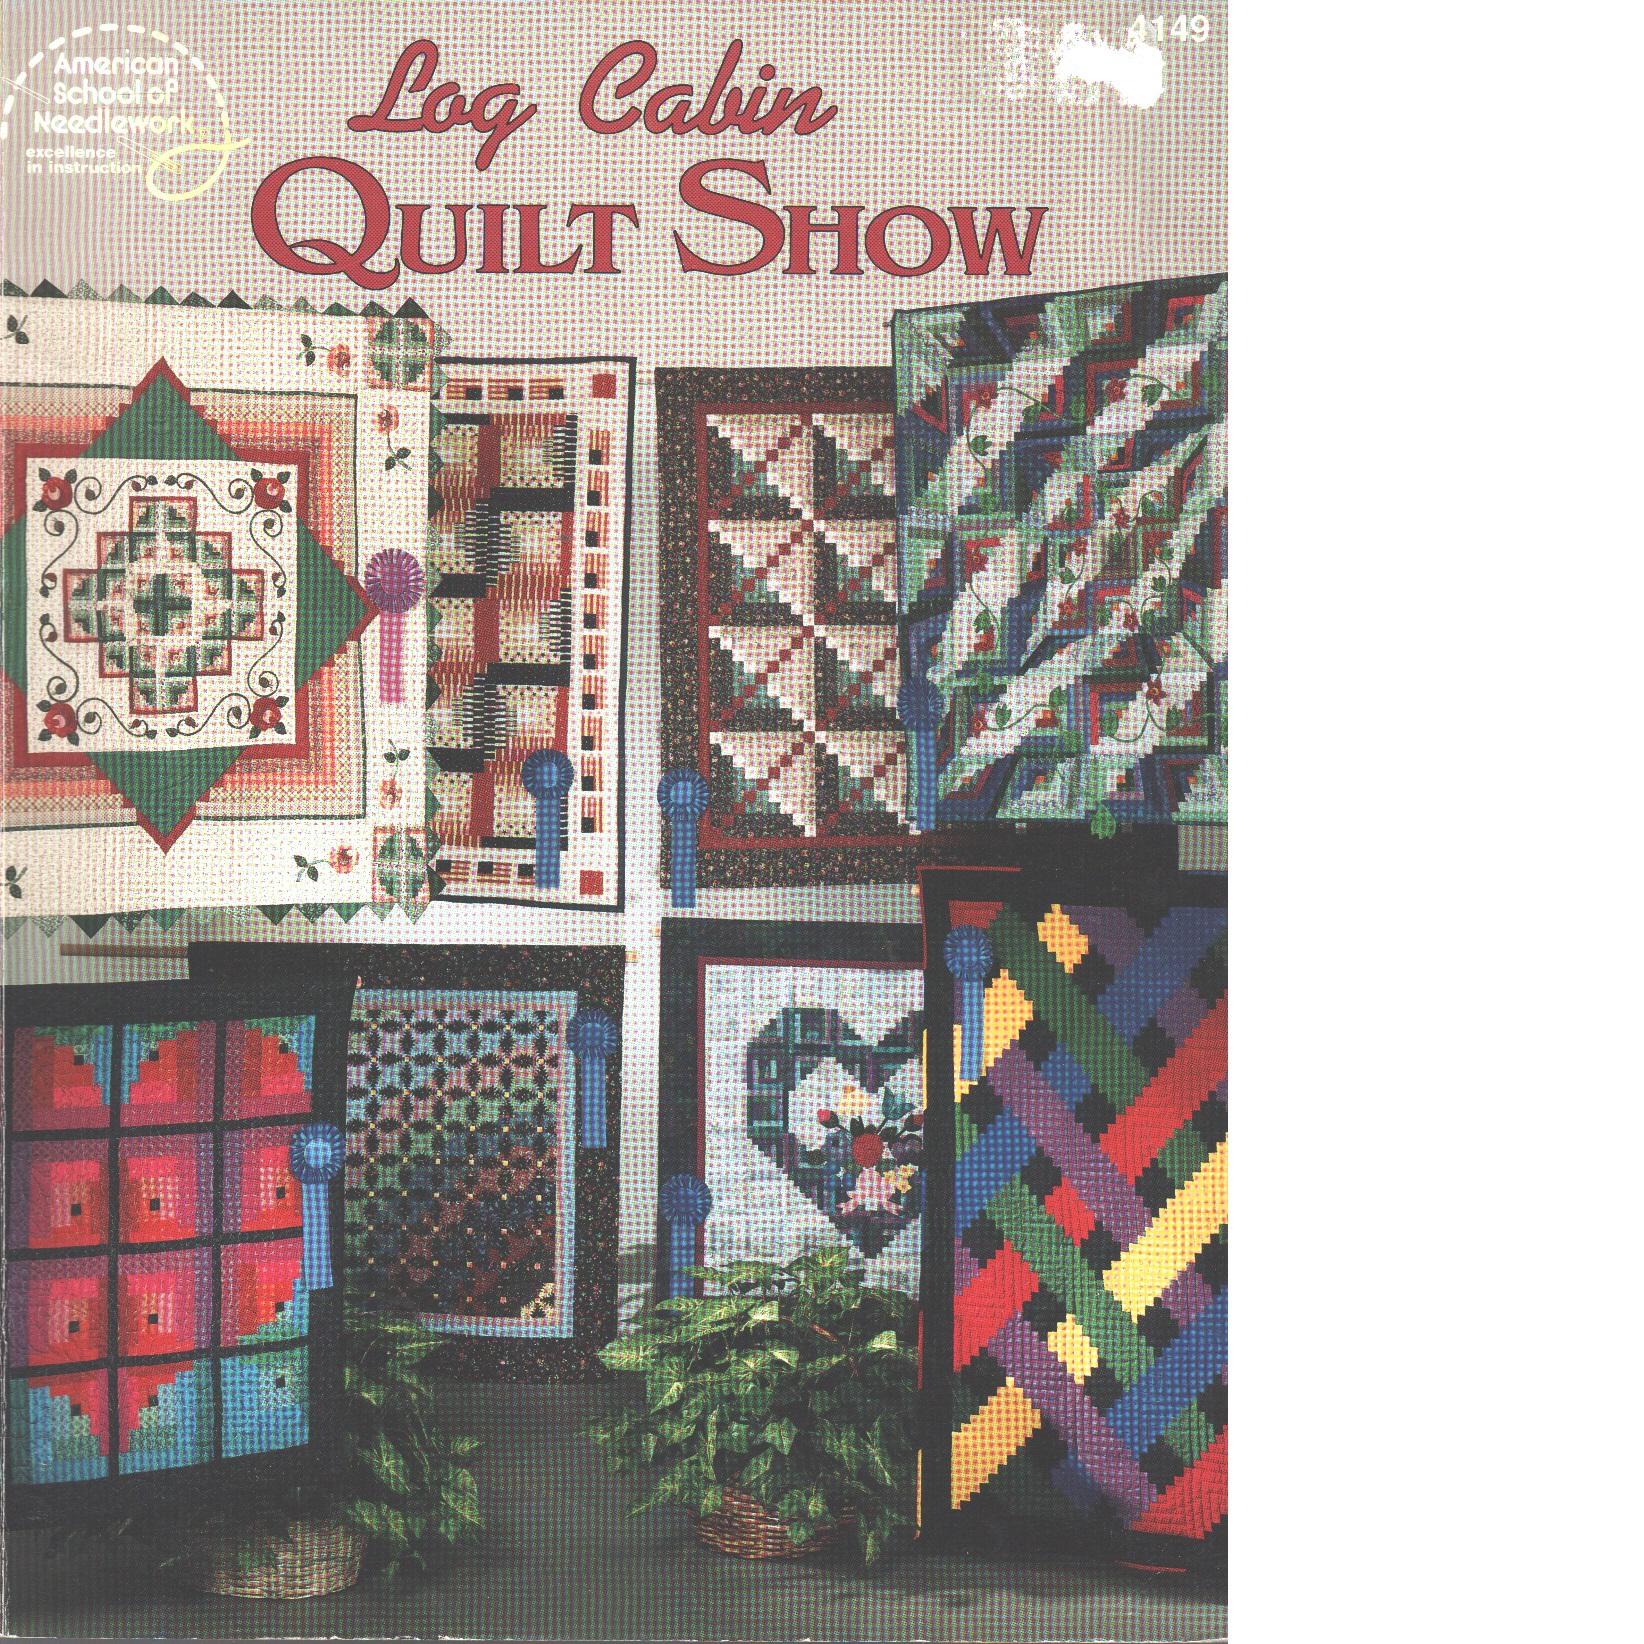 Log Cabin Quilt Show - Matela,  Bobbie